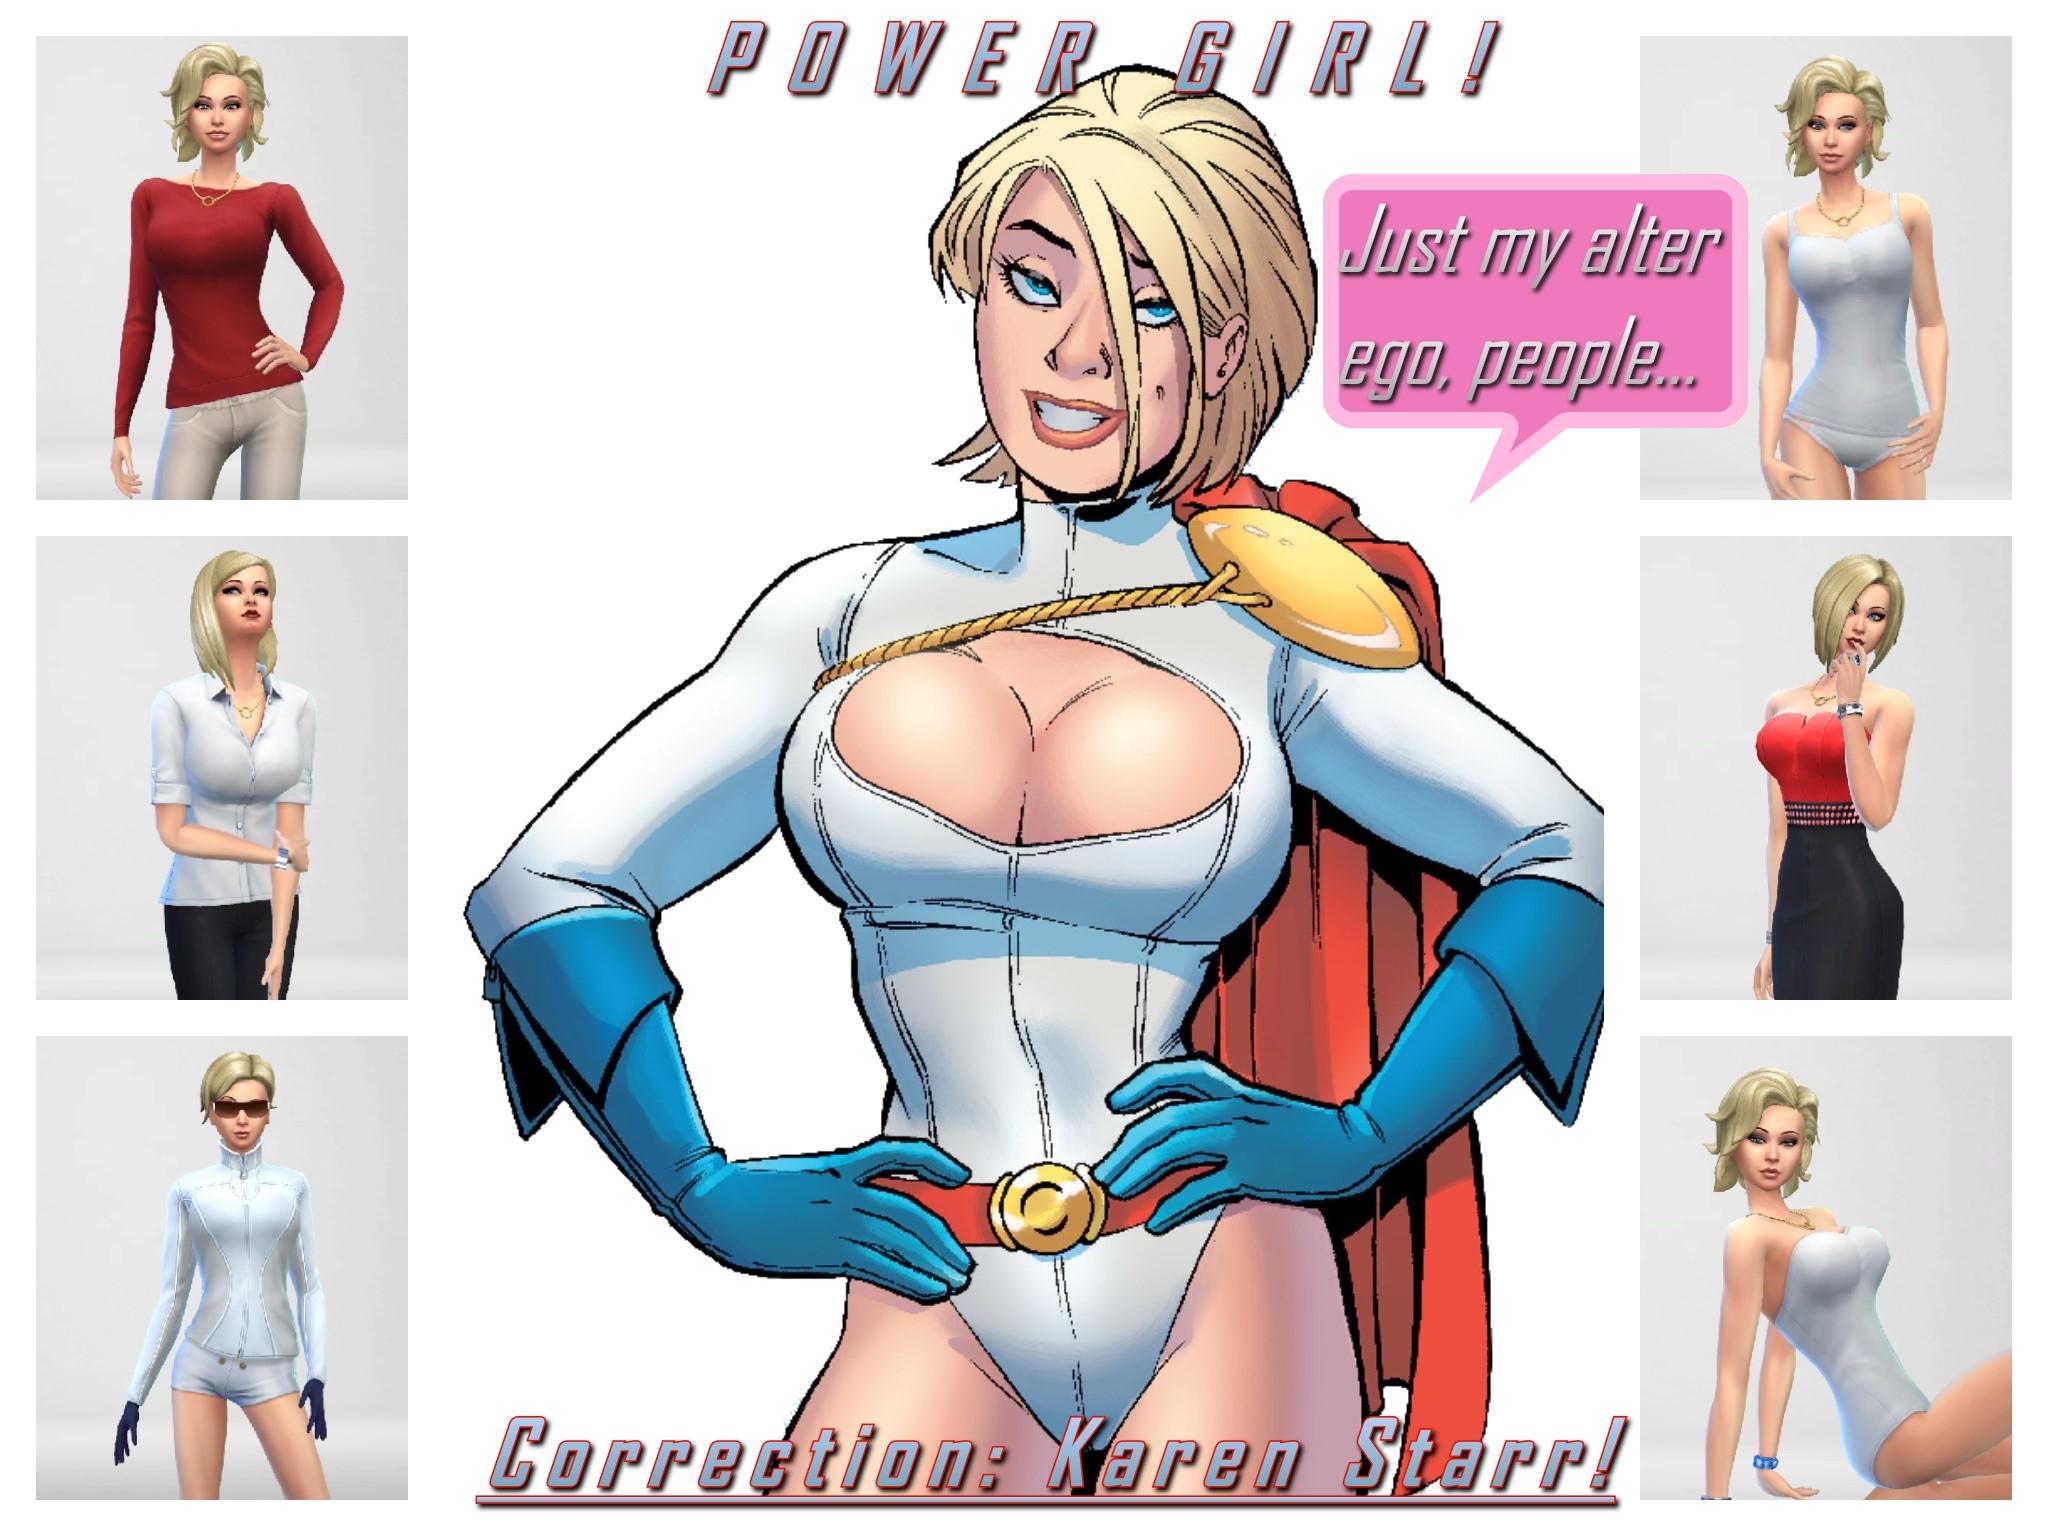 powergirlcompletion2_by_rvu-d90hidw.jpg